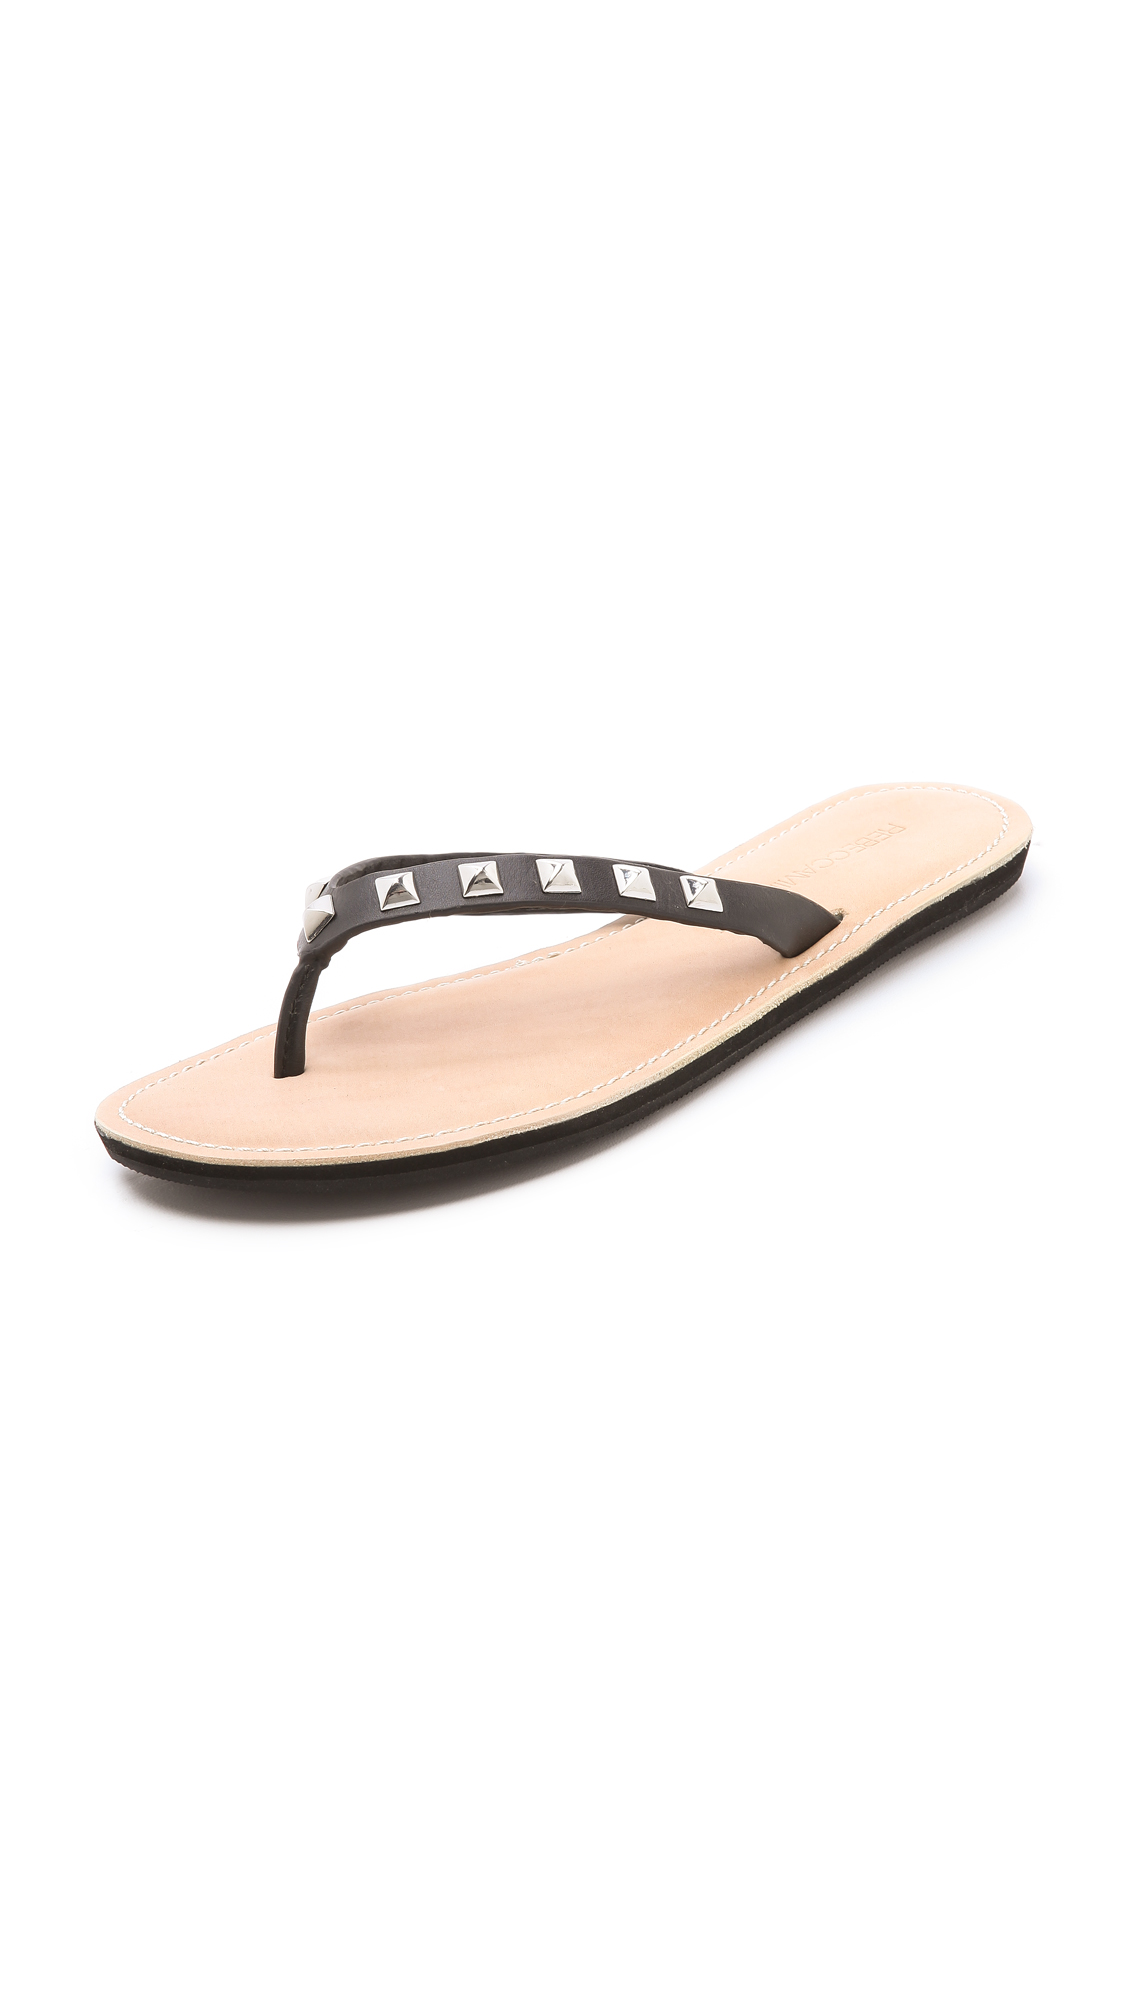 Rebecca Minkoff Fiona Studded Flip Flops In Black  Lyst-8478